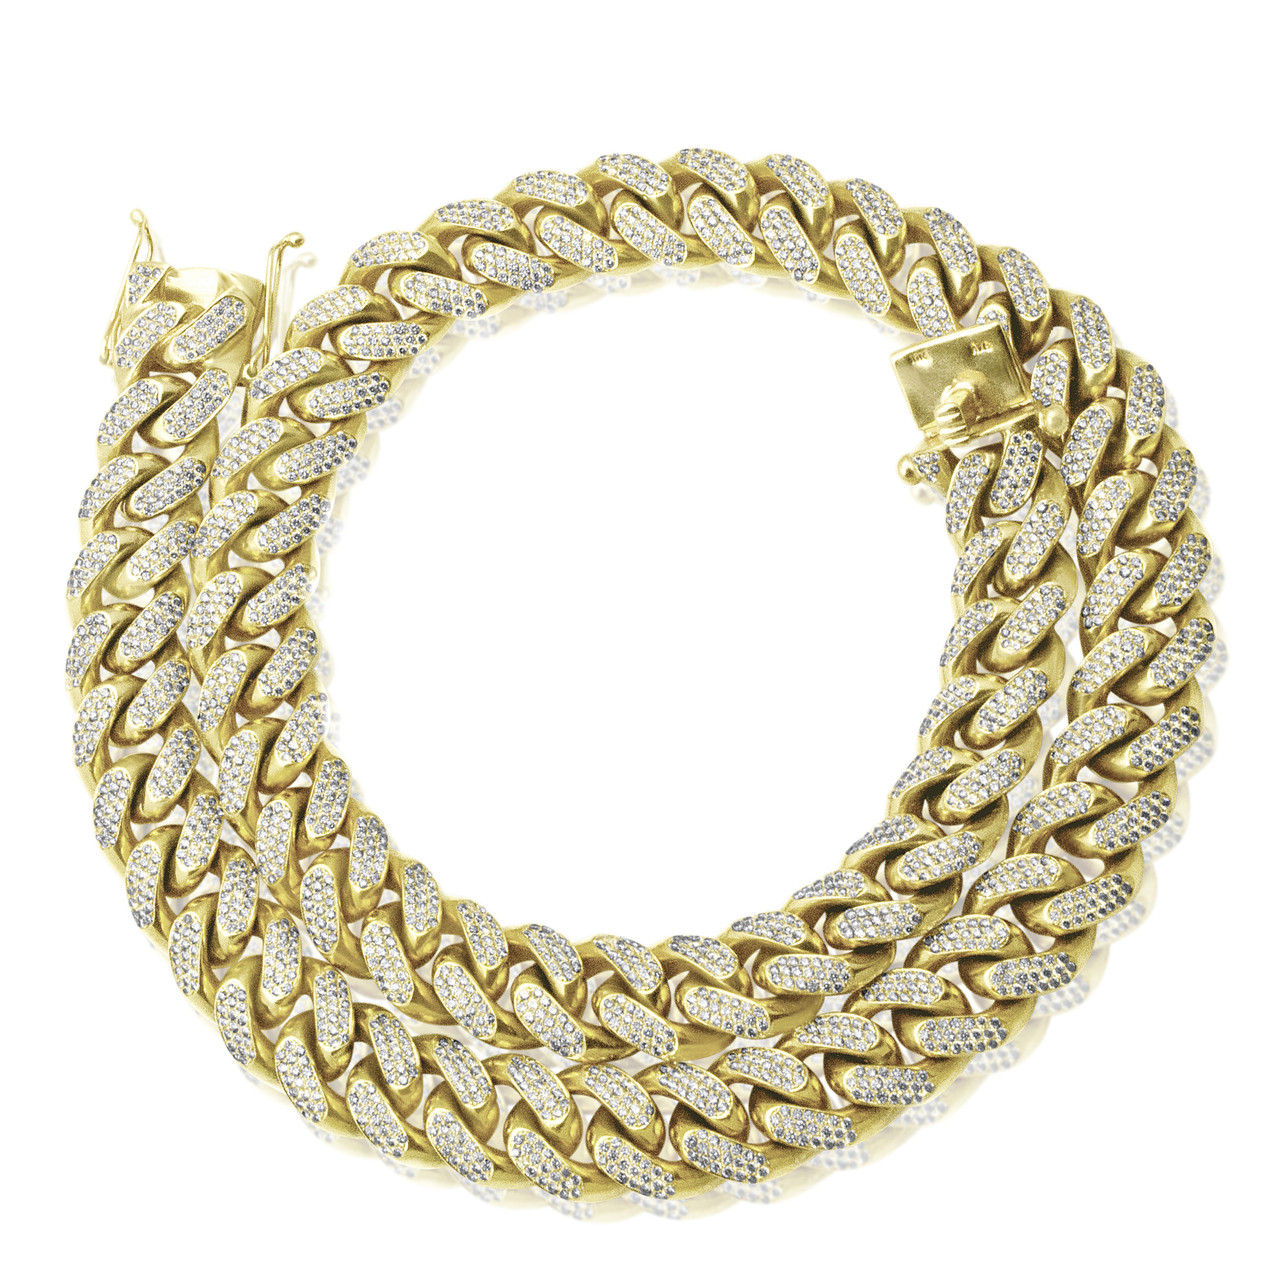 10k Gold Cuban Link Chain >> 10k Yellow Gold Xl 47ct Diamond Miami Cuban Link Chain 32in Shyne